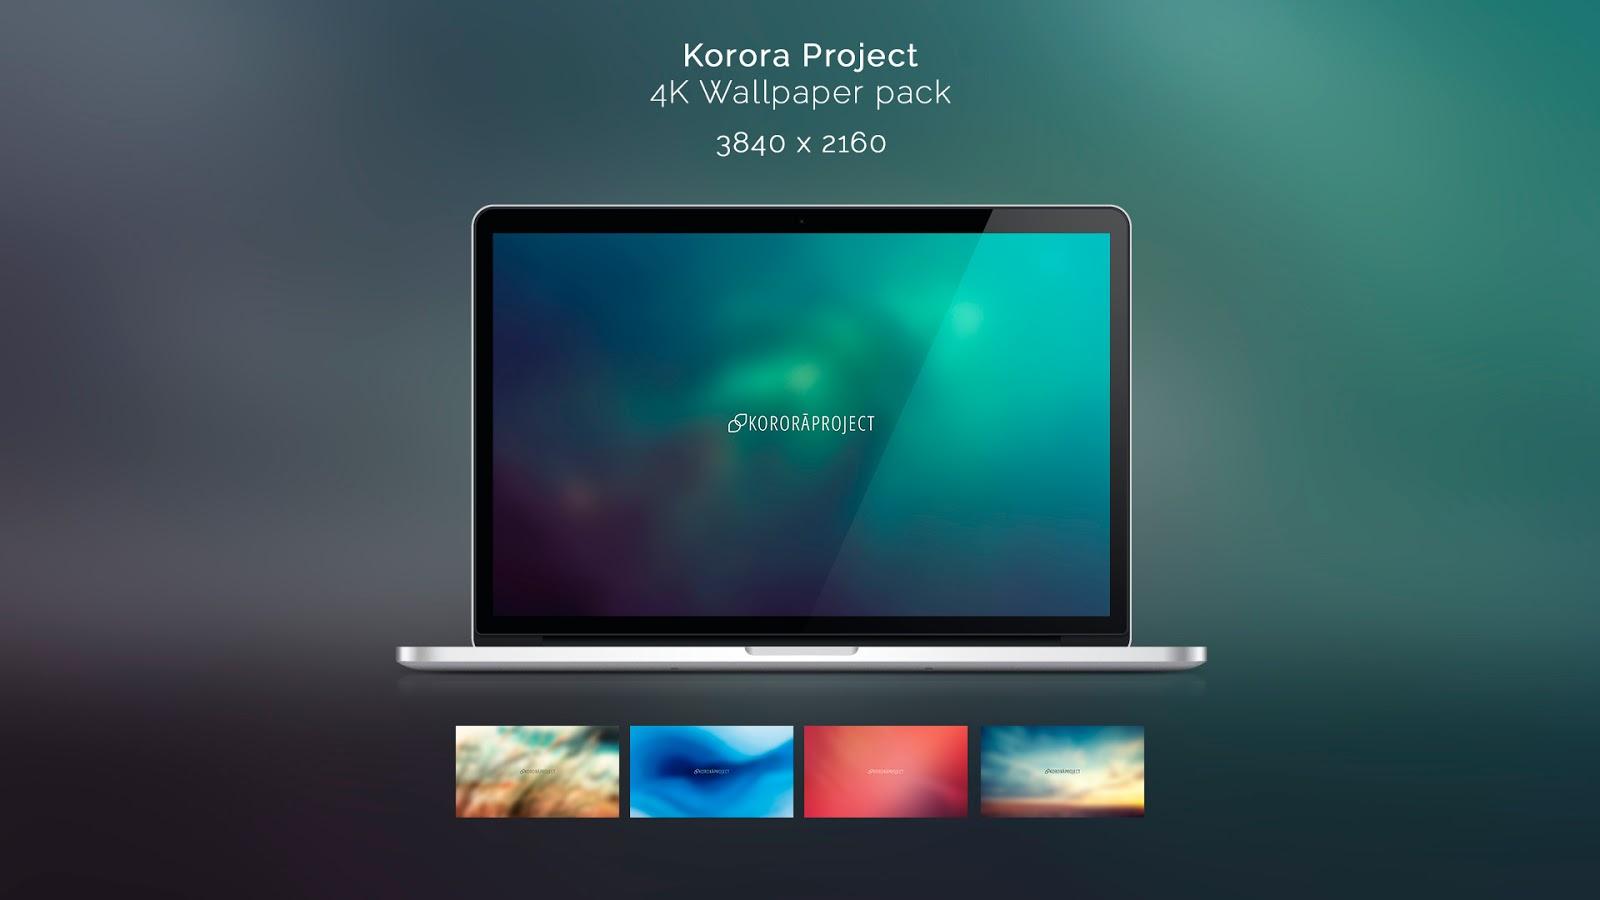 windows 10 wallpaper pack,text,multimedia,technology,screenshot,display device